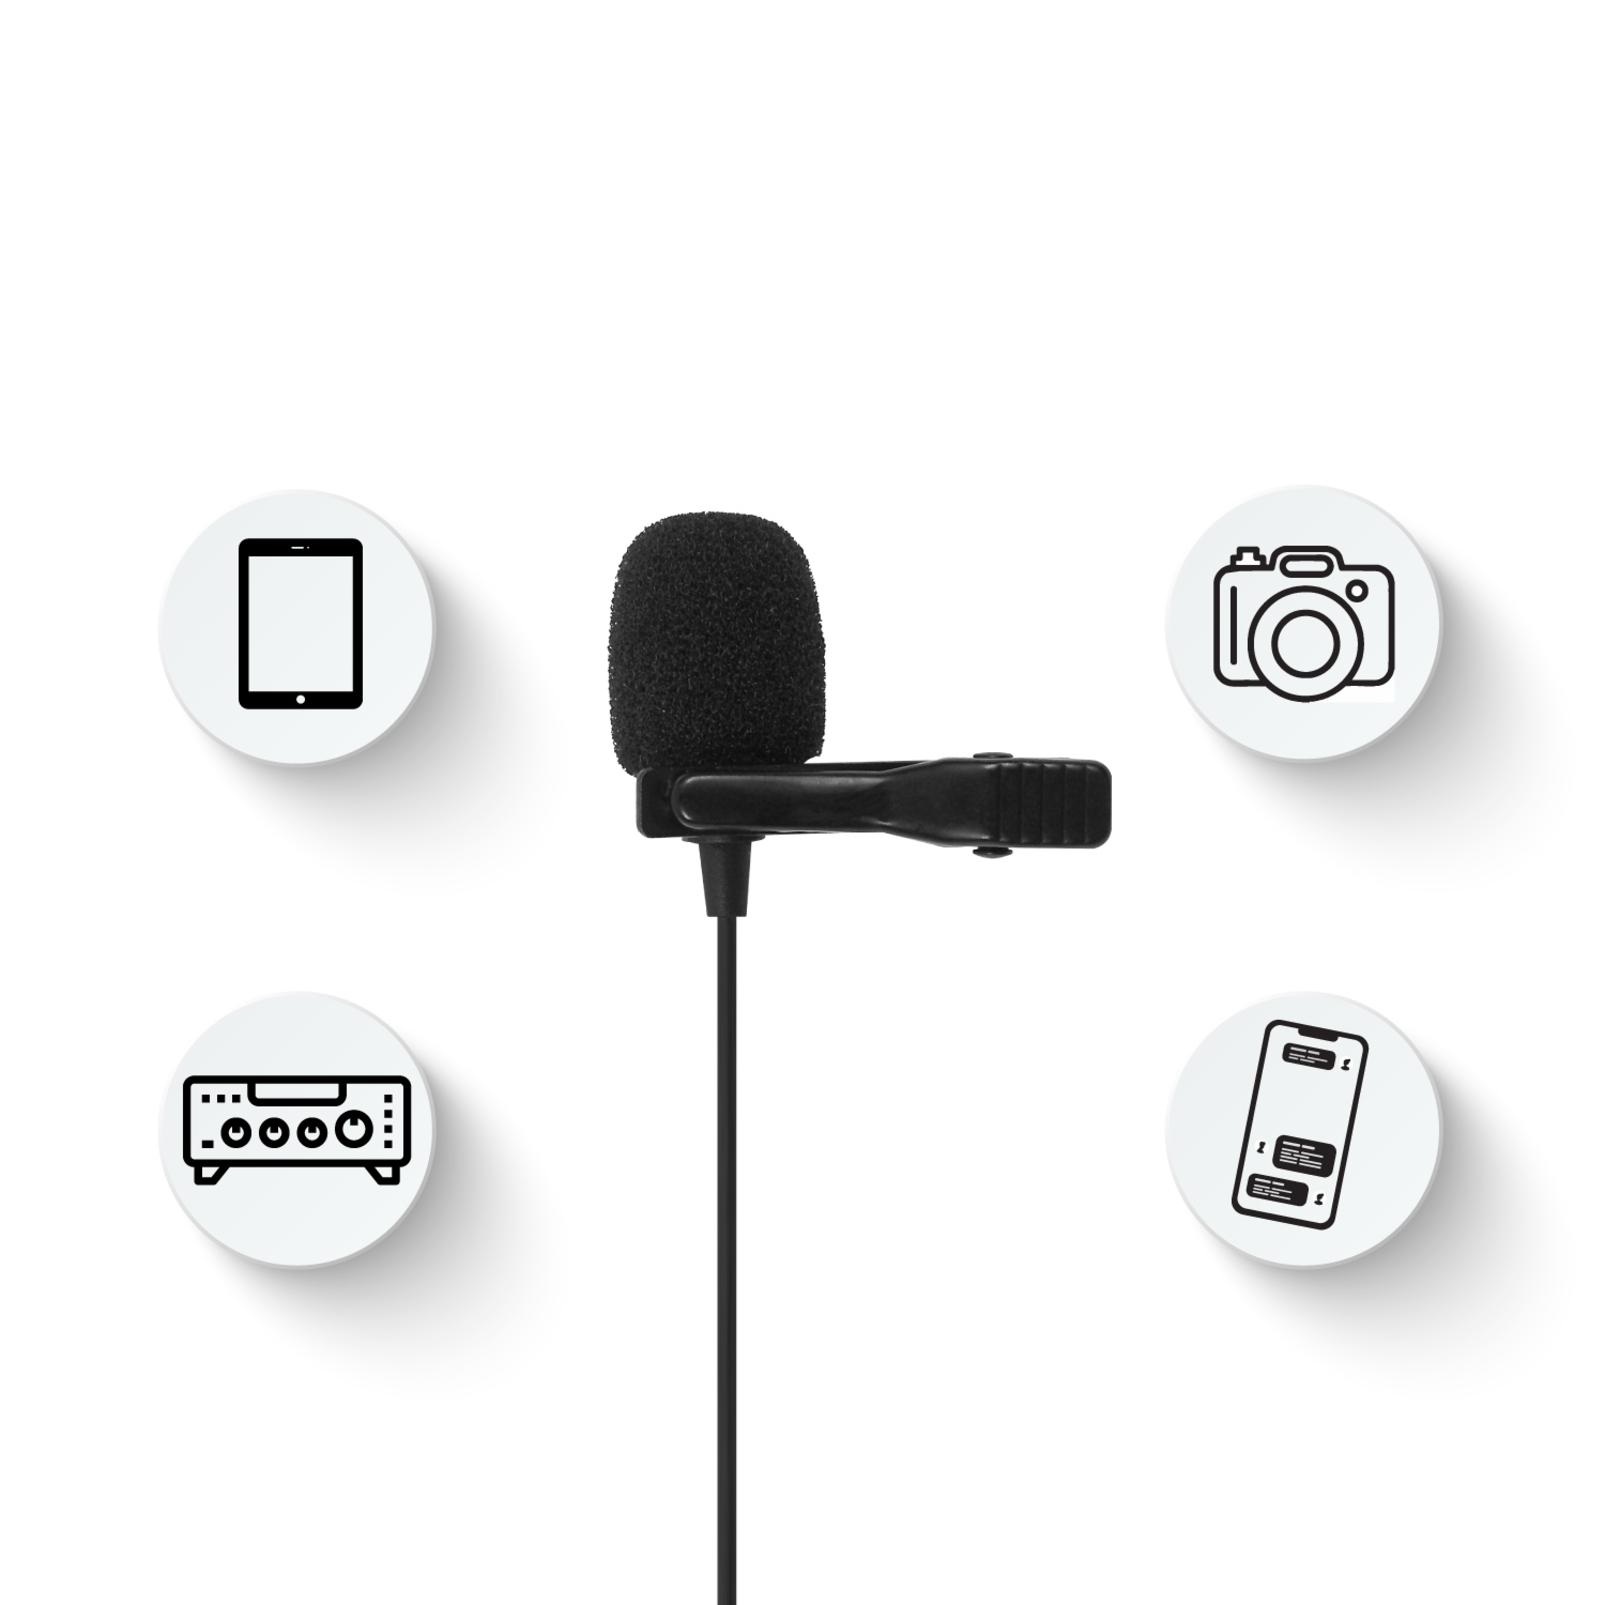 JBLCSLM20B - Black - Battery-Powered Lavalier Microphone - Detailshot 2